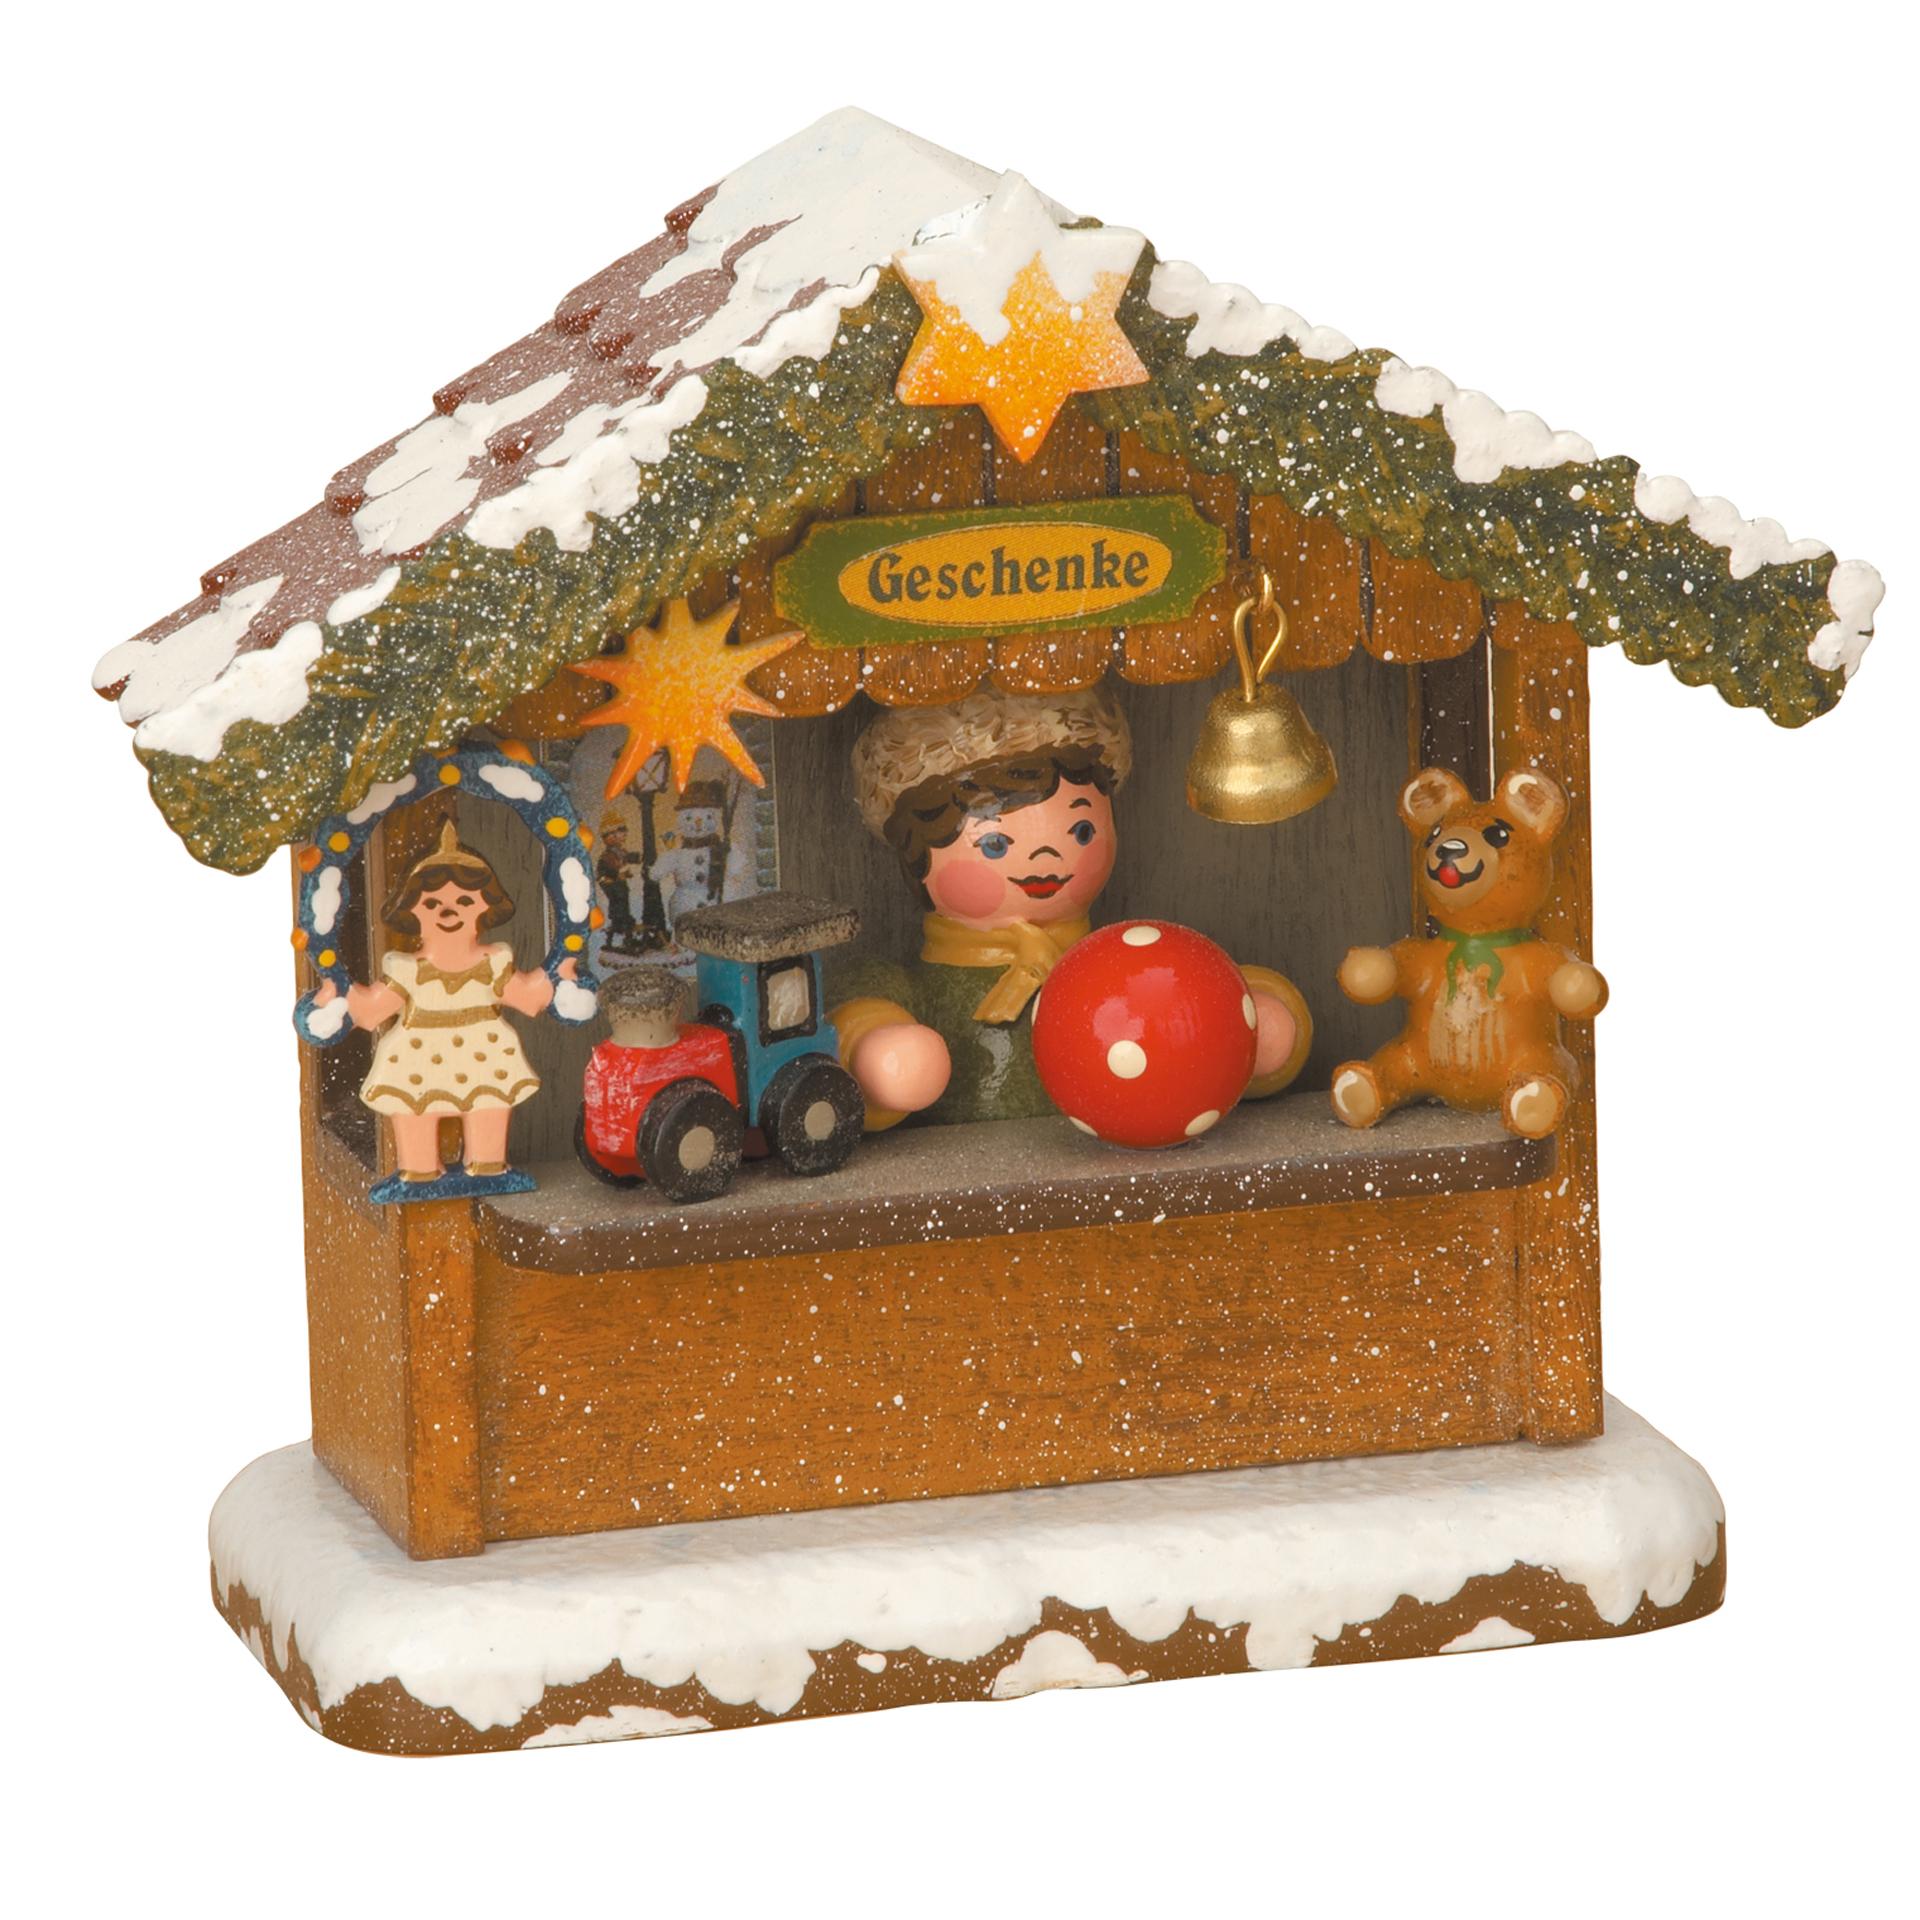 Winterkinder Geschenkehäusel